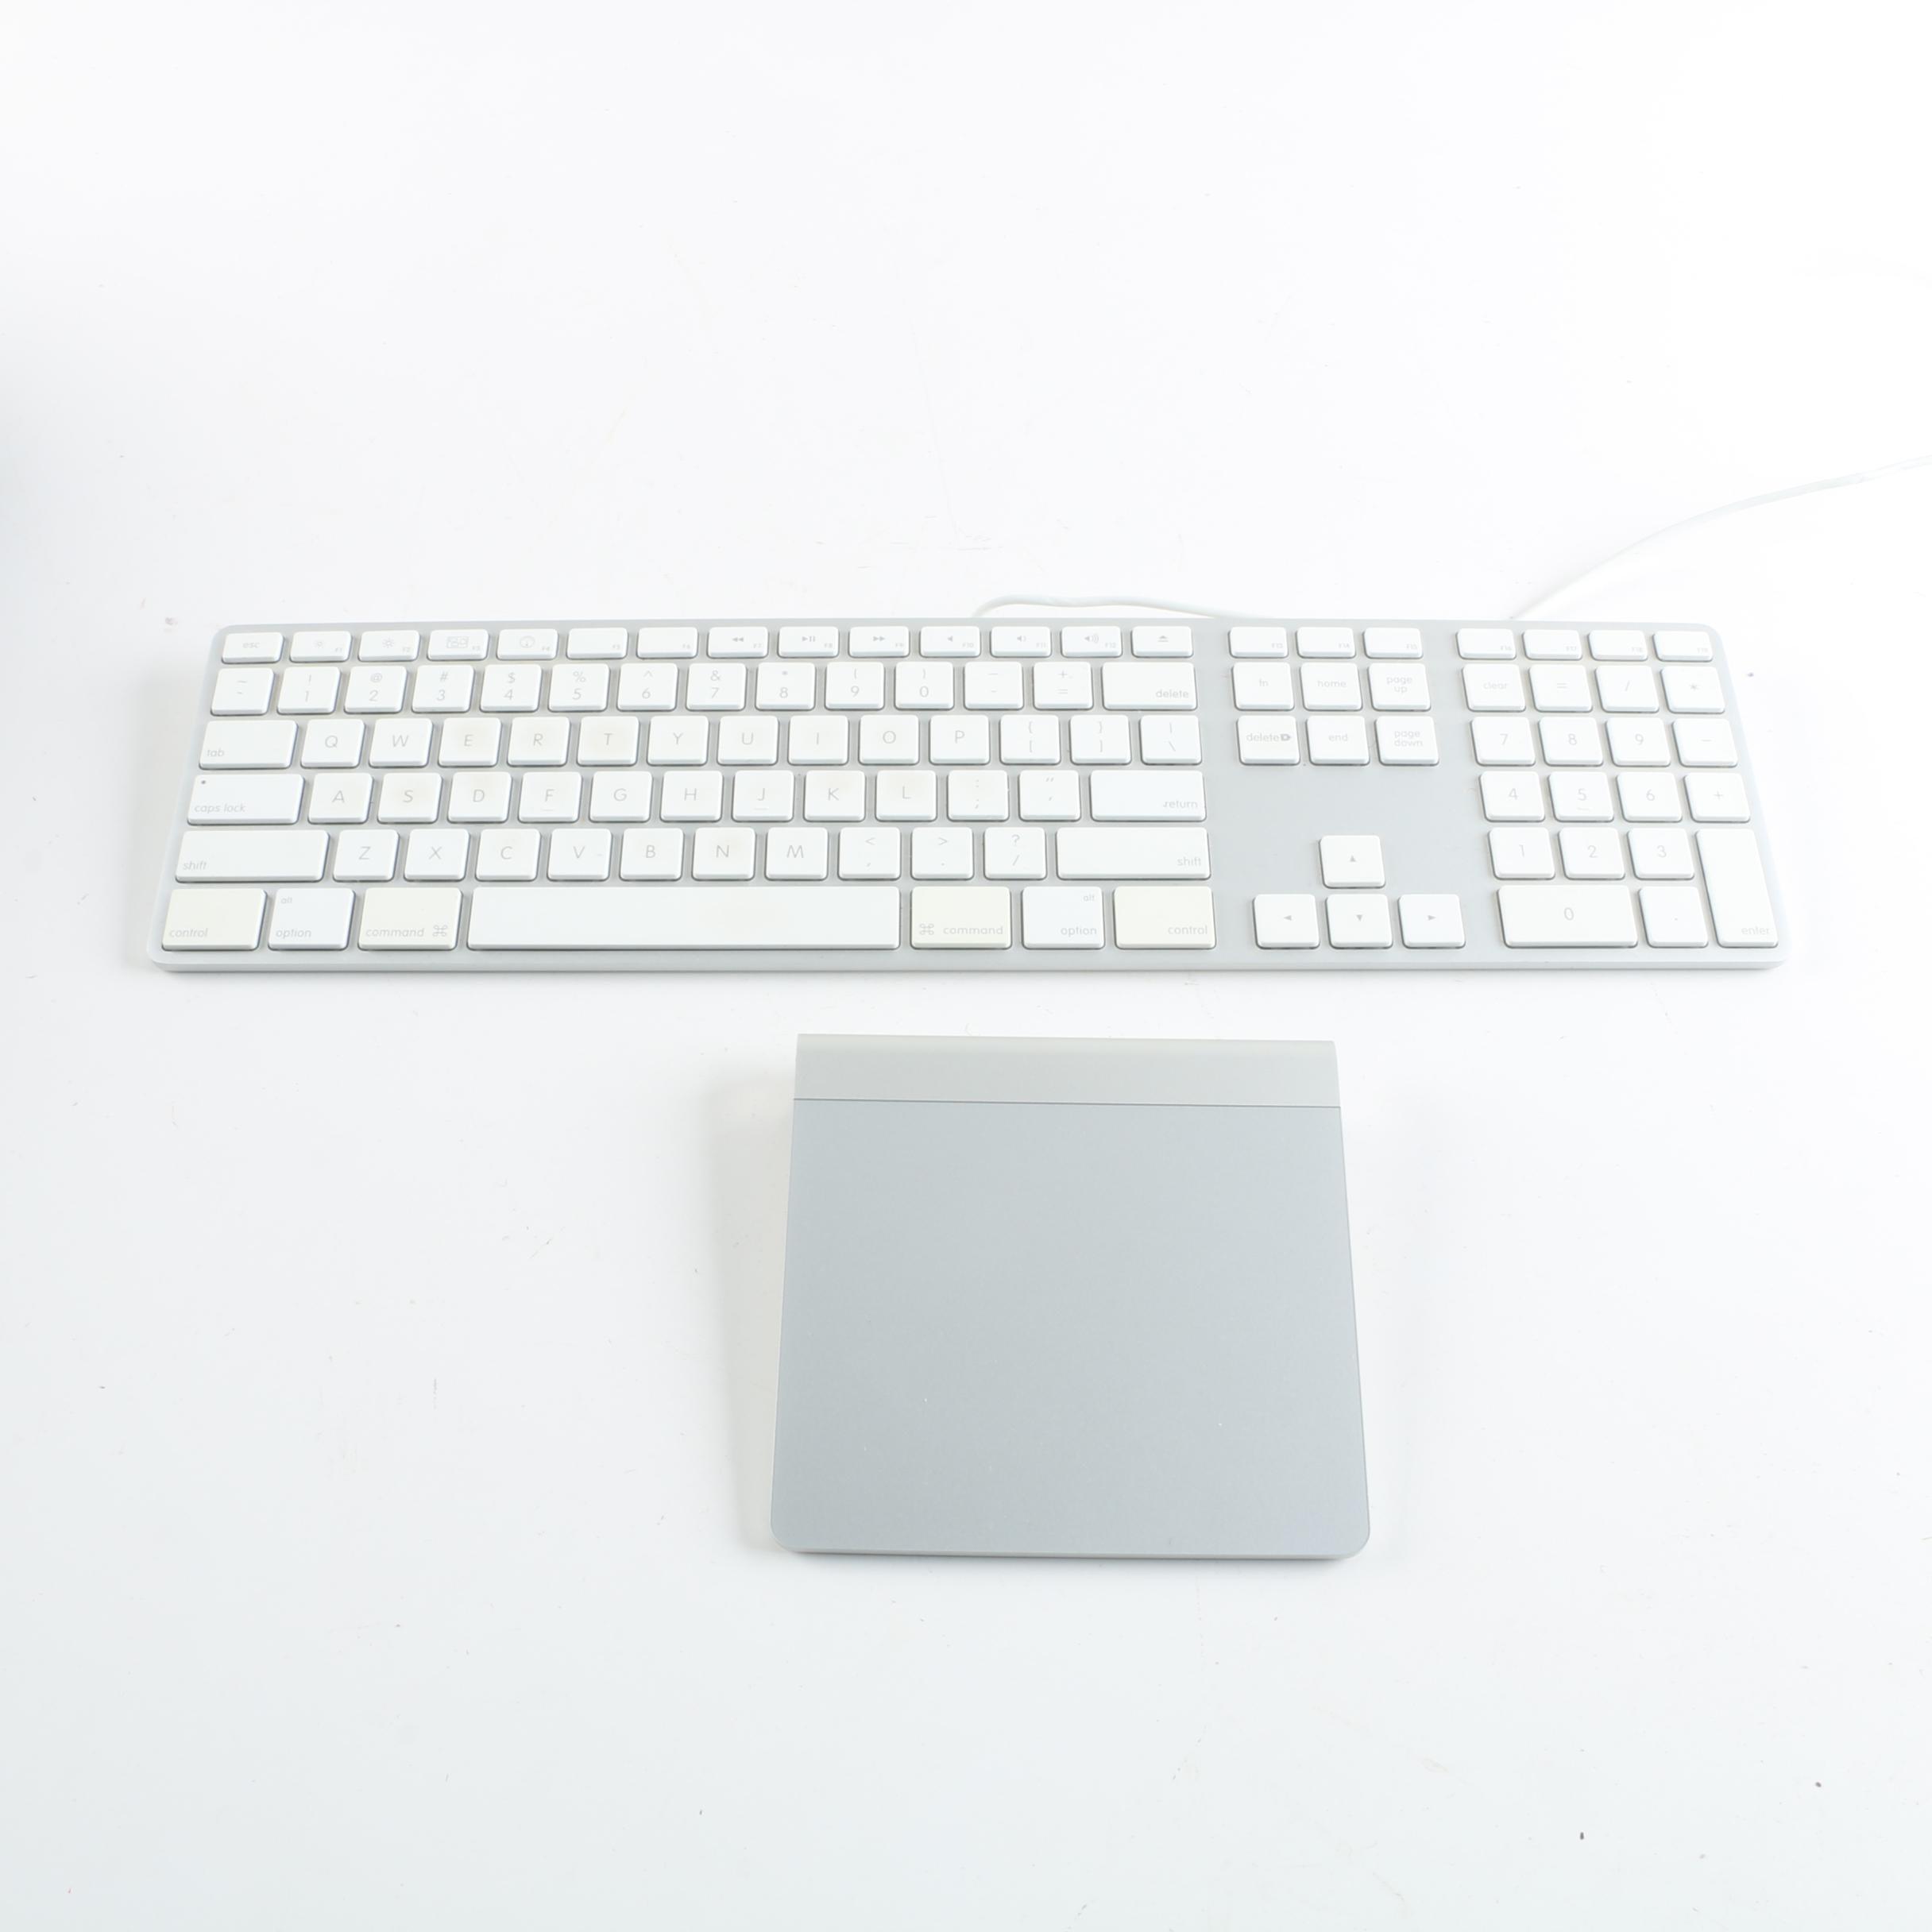 Apple A1243 Keyboard and A1339 Wireless Magic Trackpad